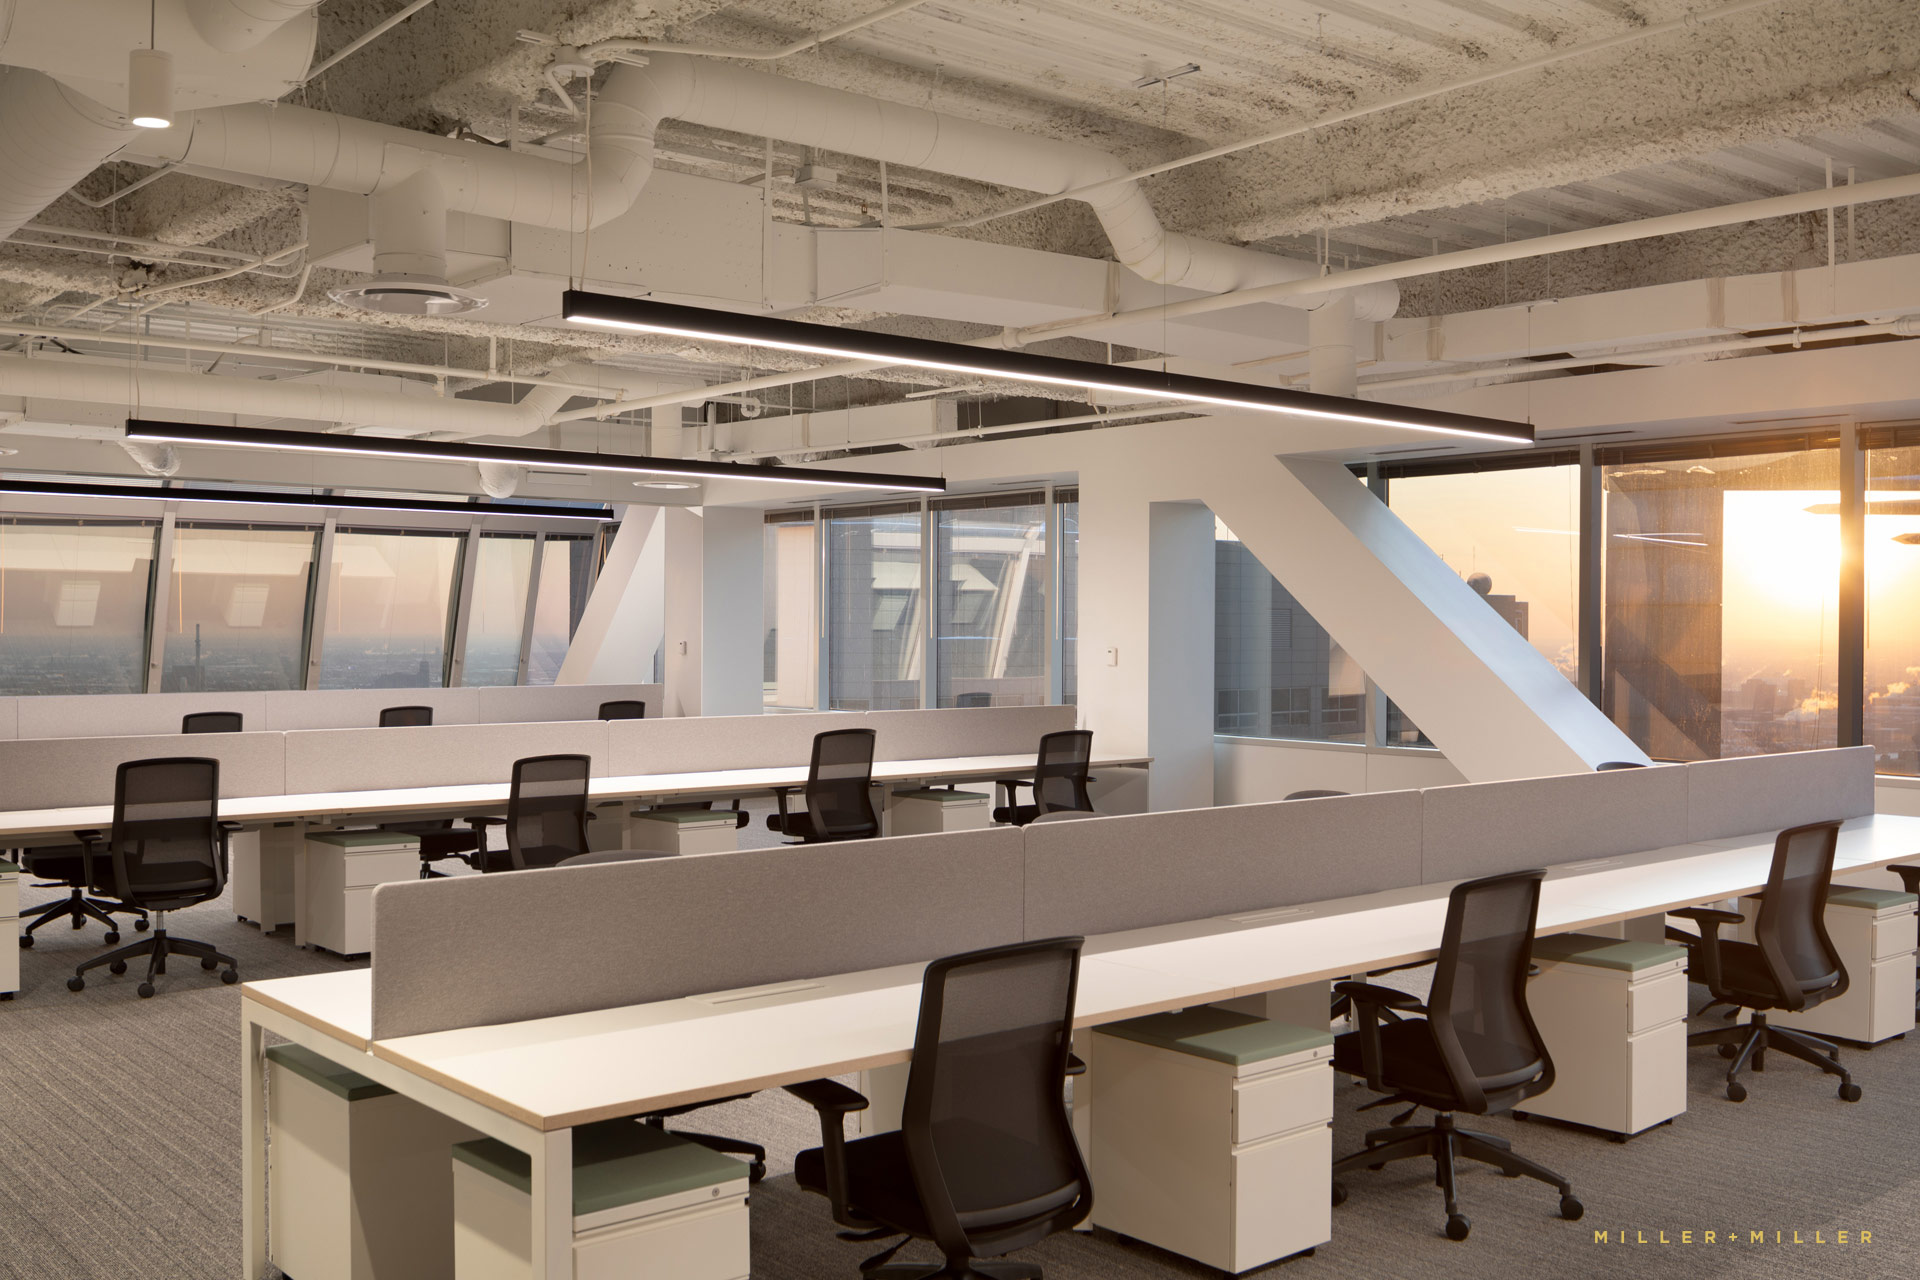 Office View Windows Skyline